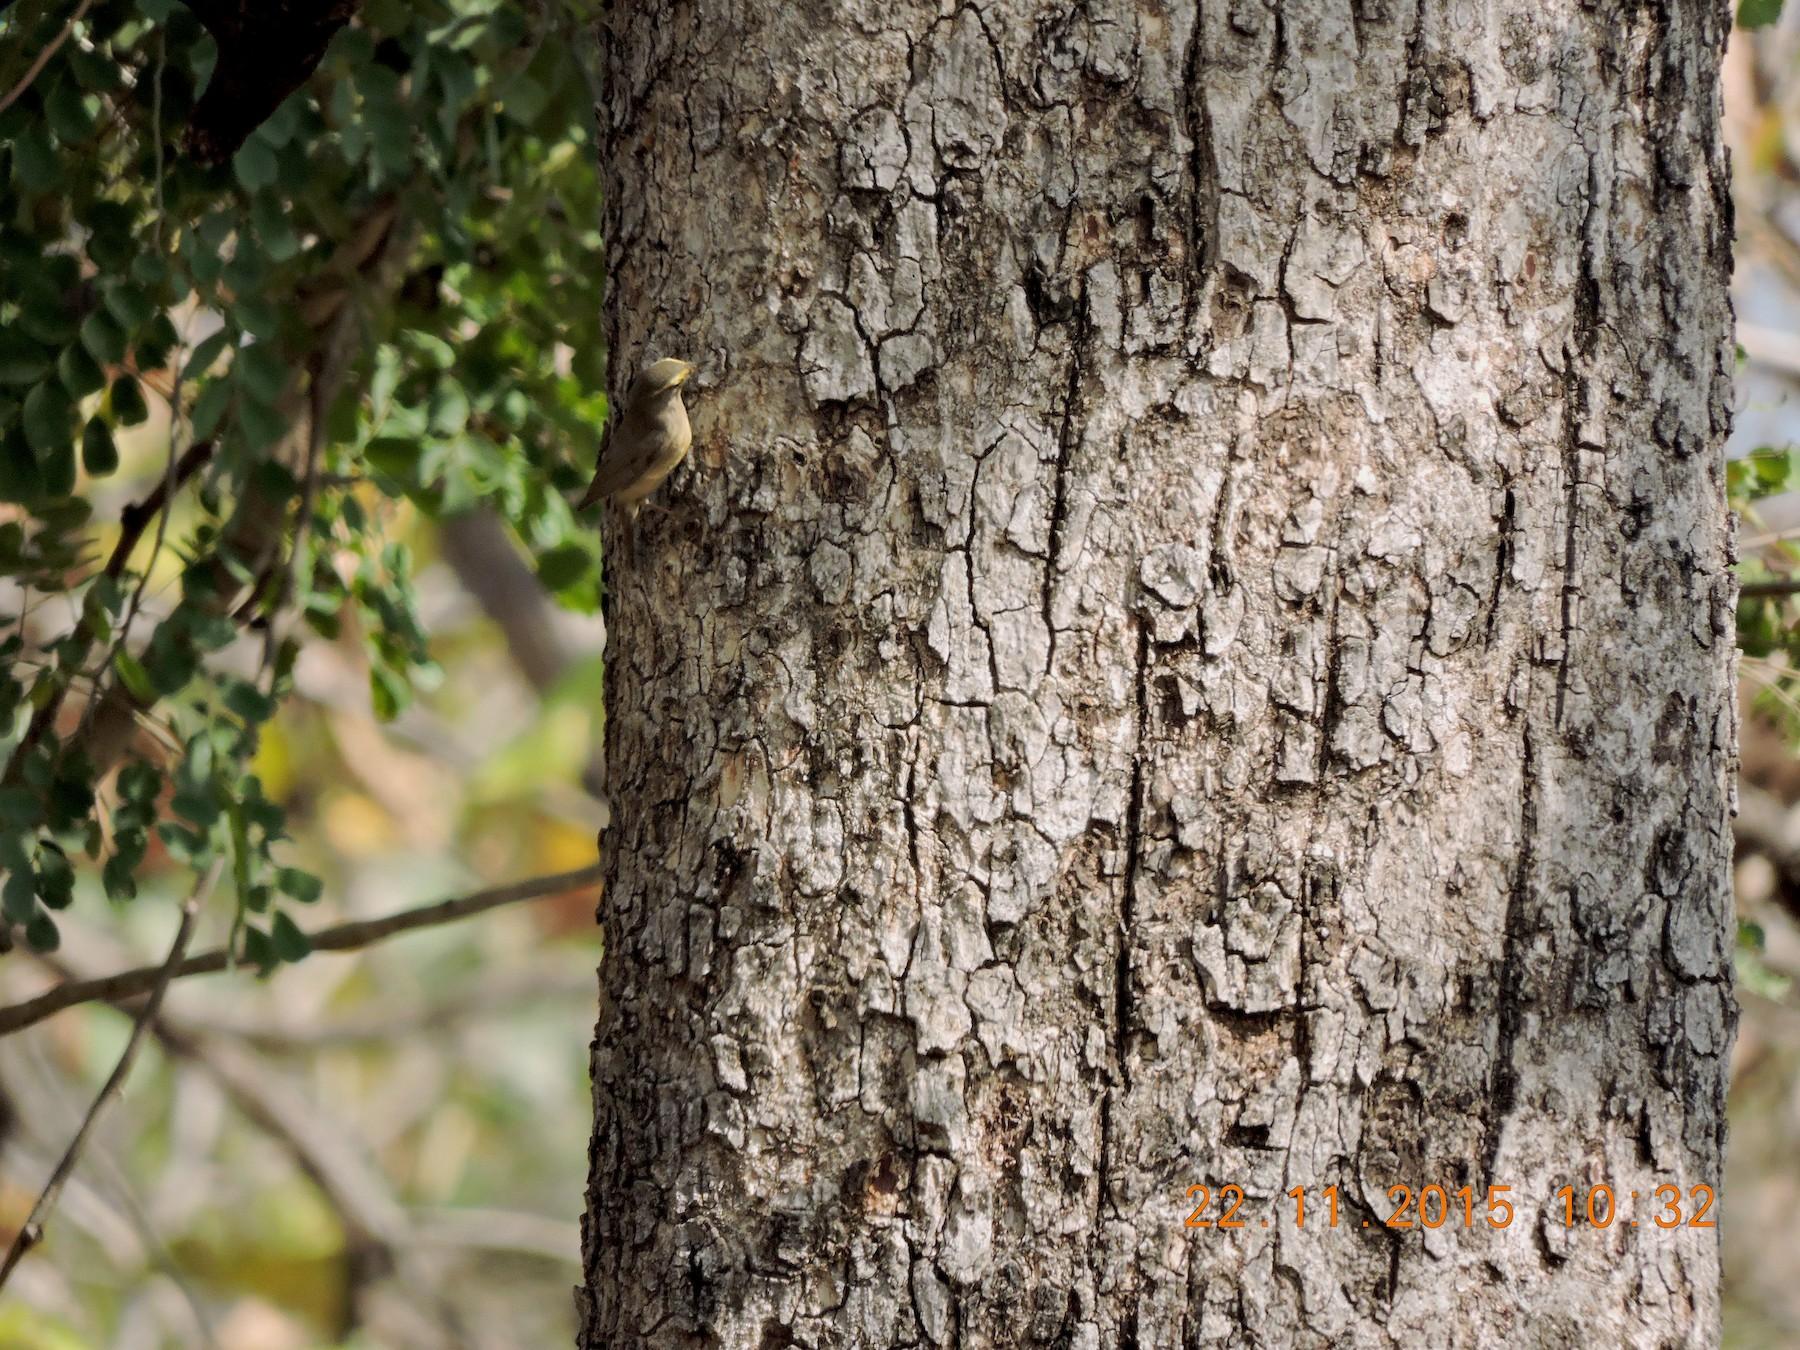 Sulphur-bellied Warbler - Anil Subramaniam